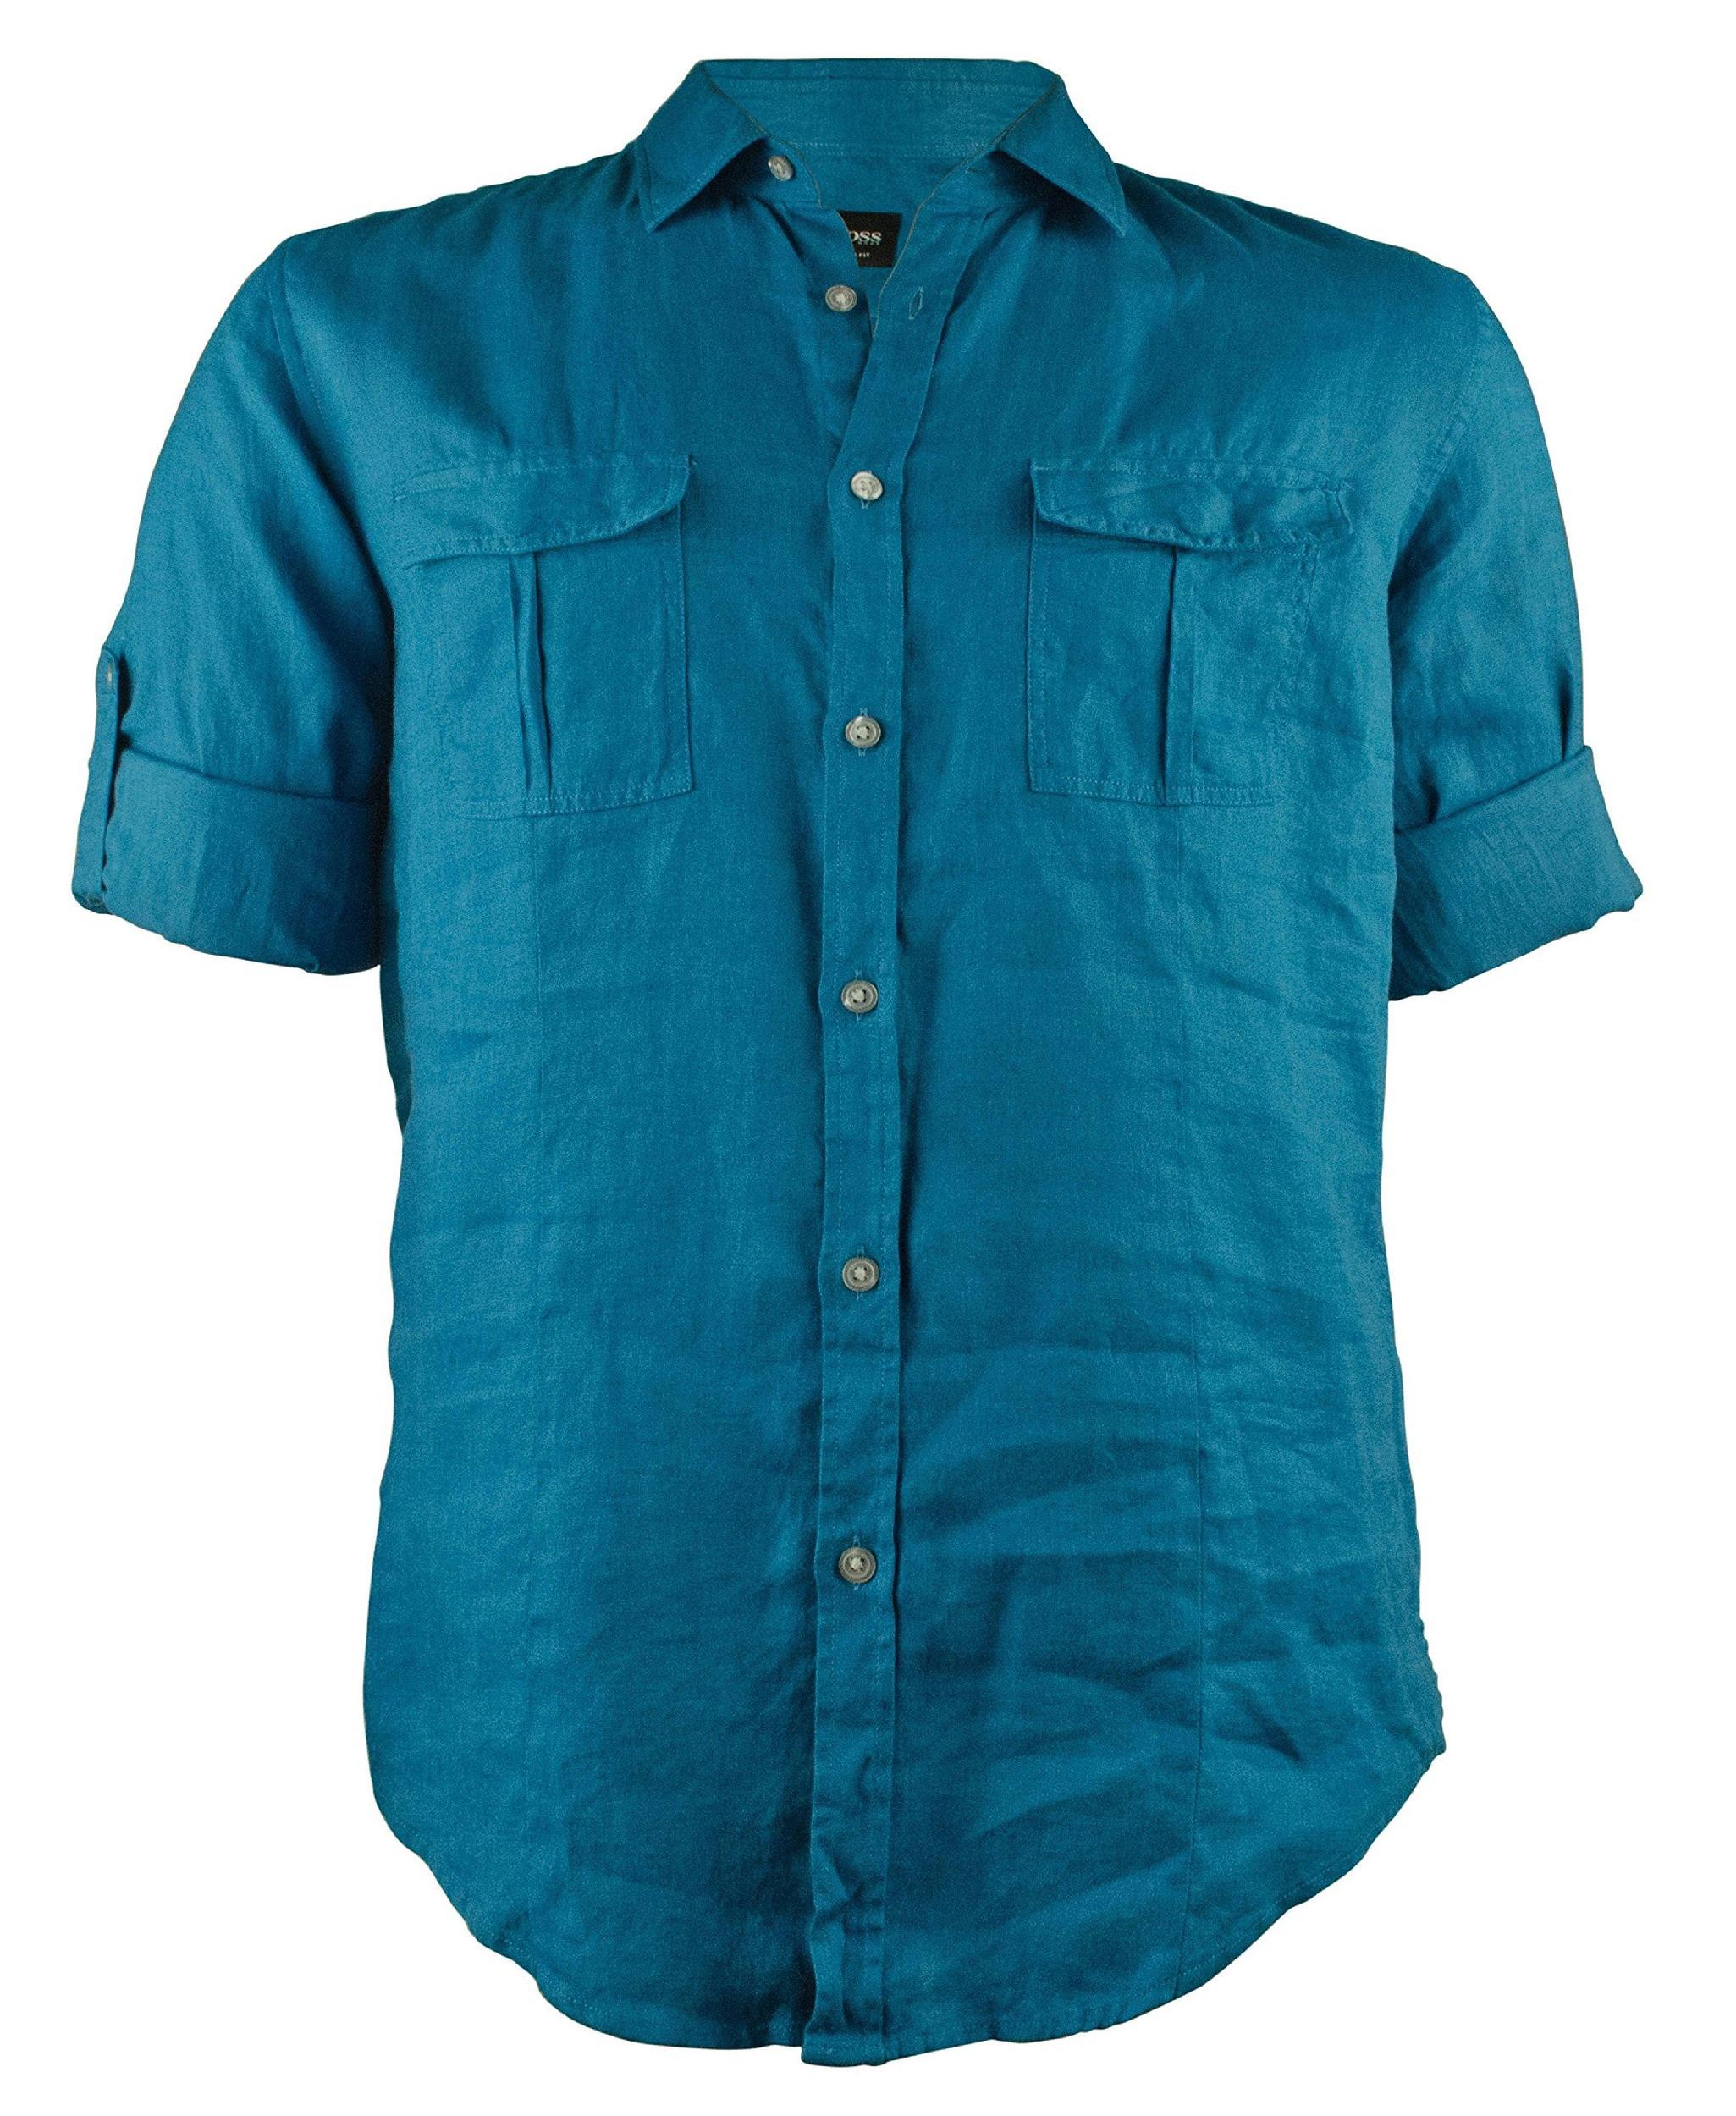 boss hugo boss omer men 39 s long sleeve slim fit shirt ebay. Black Bedroom Furniture Sets. Home Design Ideas